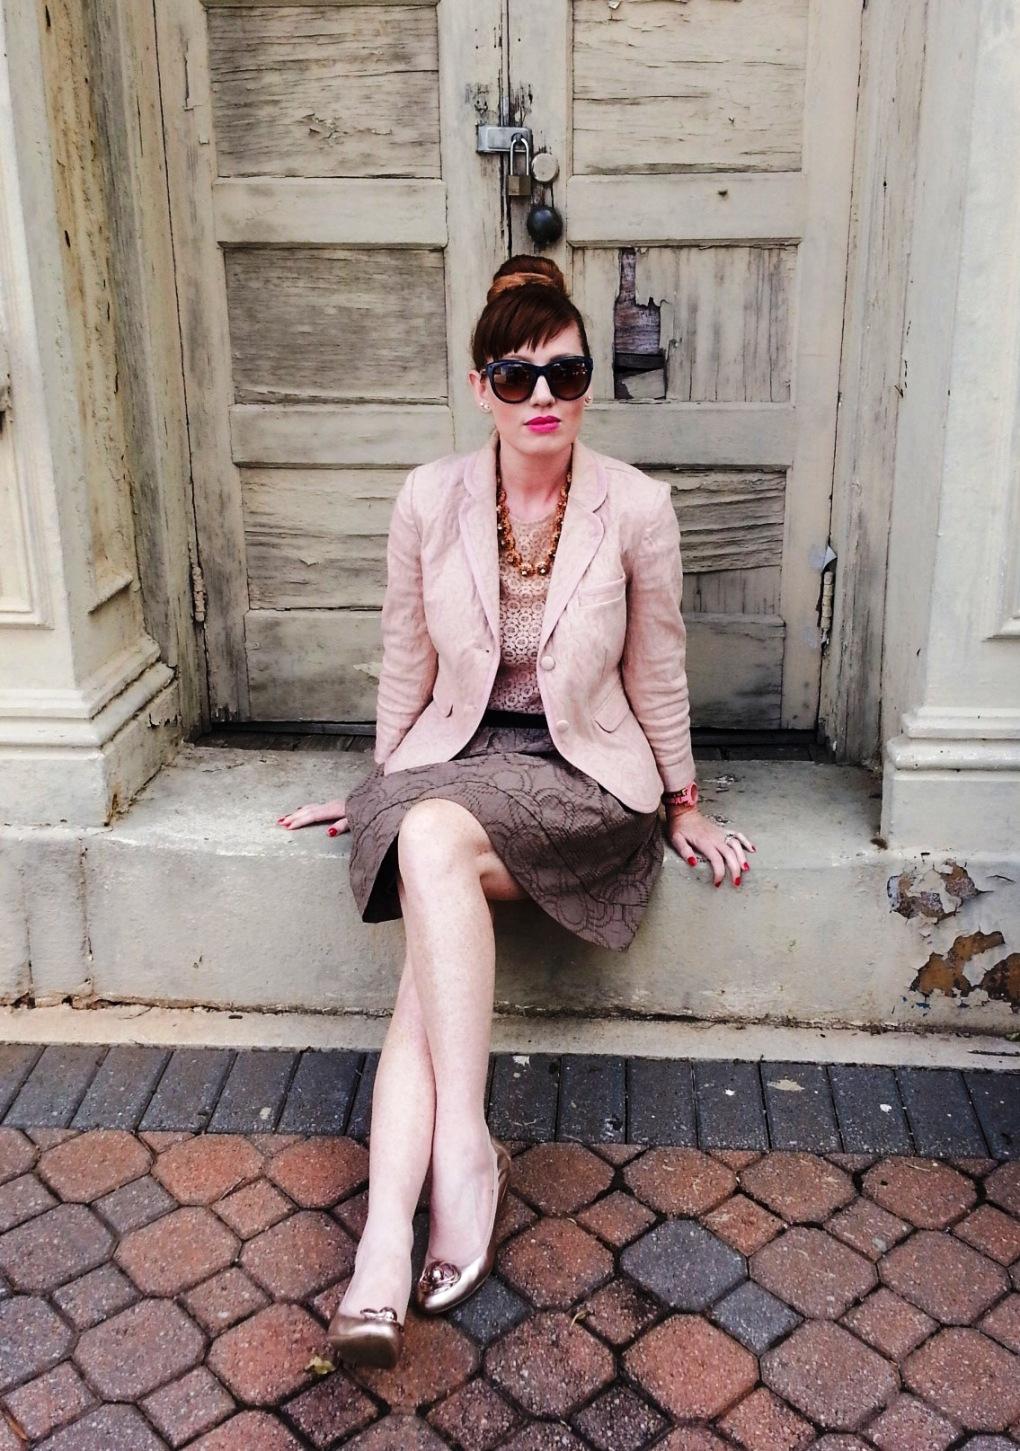 Jacket and Skirt: Simply Vera by Vera Wang Blouse: Ann Taylor  Shoes: Franco Sarto Bag: Kate Spade Necklace: JCREW Sunnies: Franco Sarto